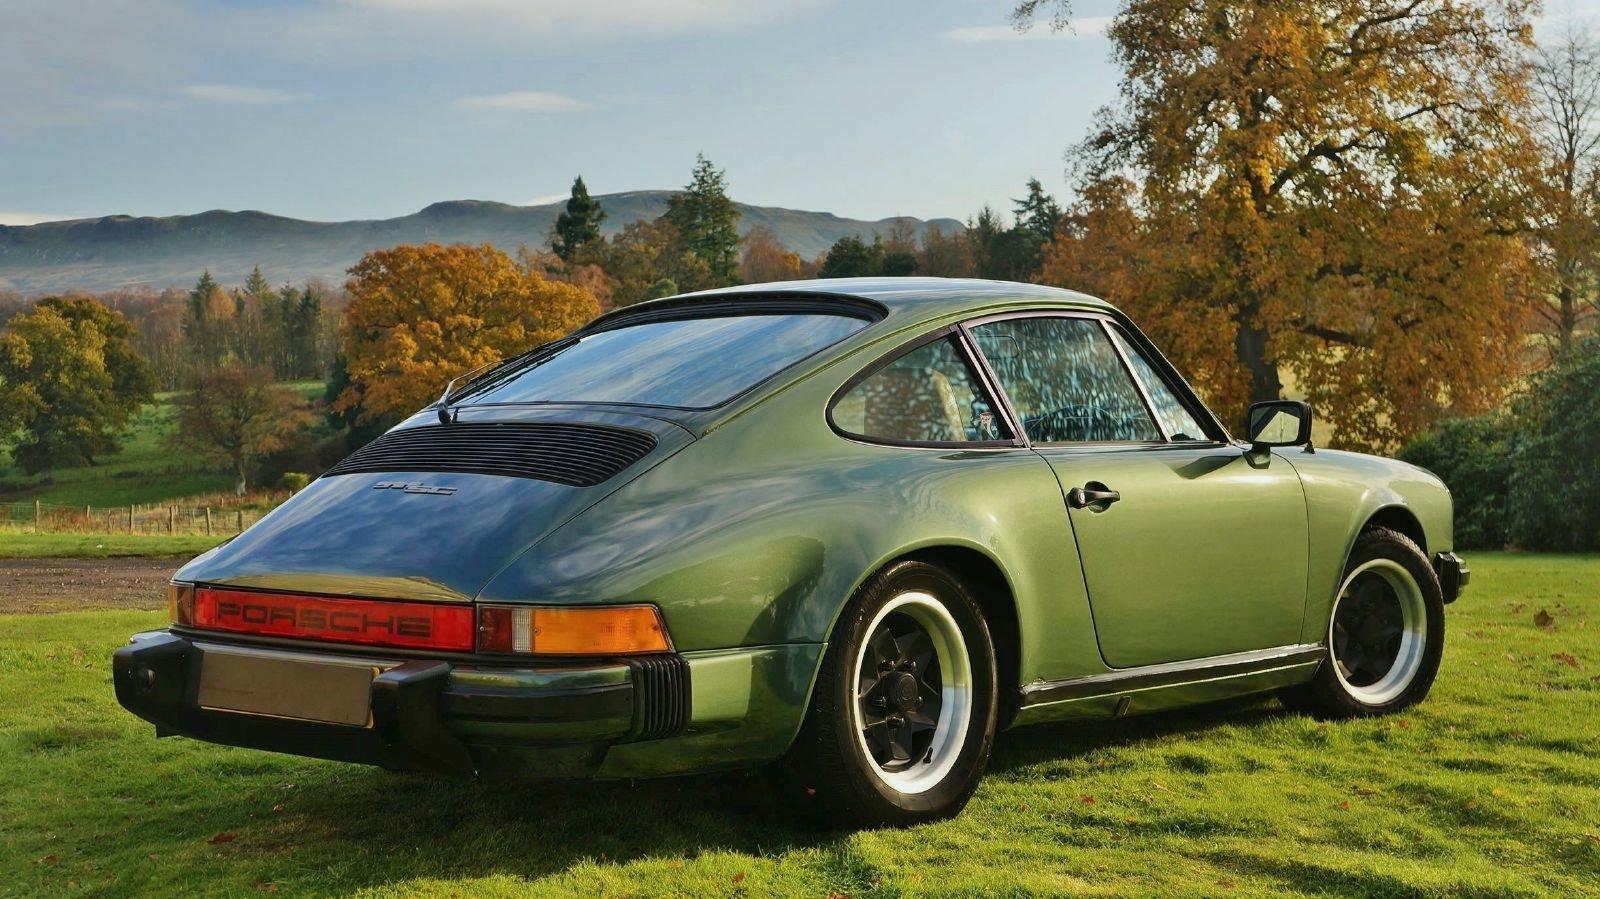 1979 Porsche 911 SC Oak Green Coupe For Sale (picture 3 of 6)